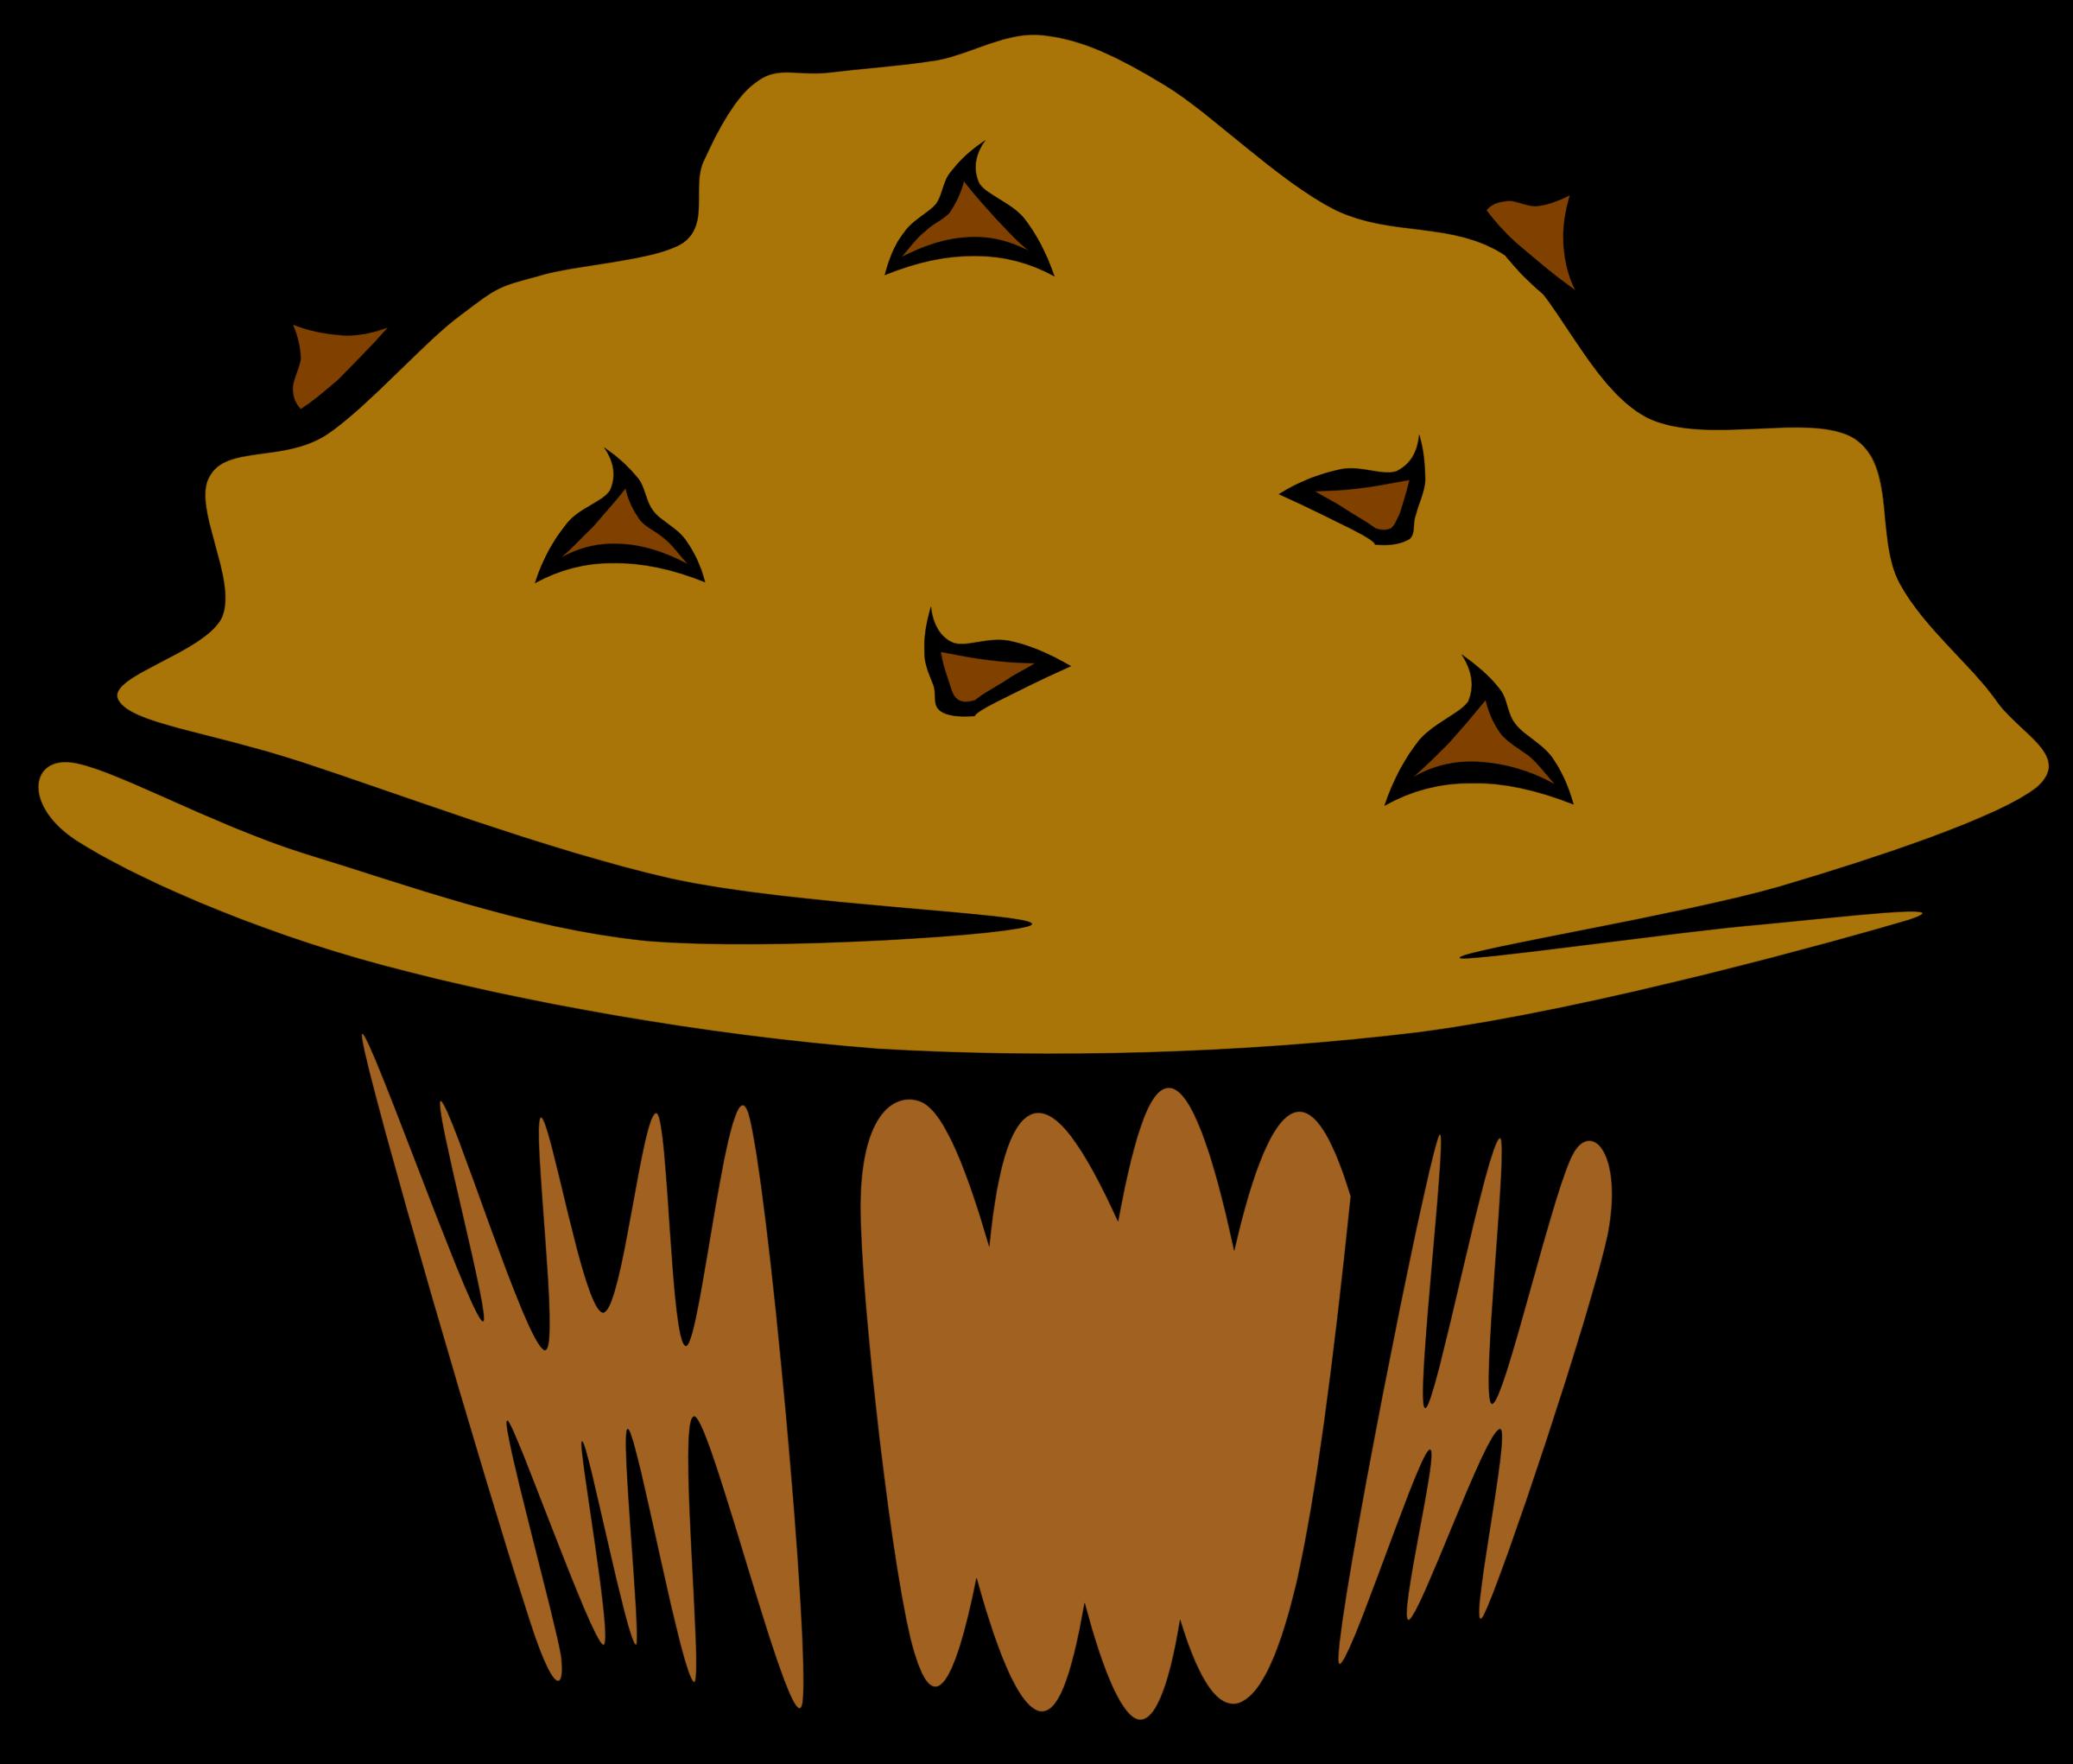 Muffins clipart five. Fast food breakfast muffin